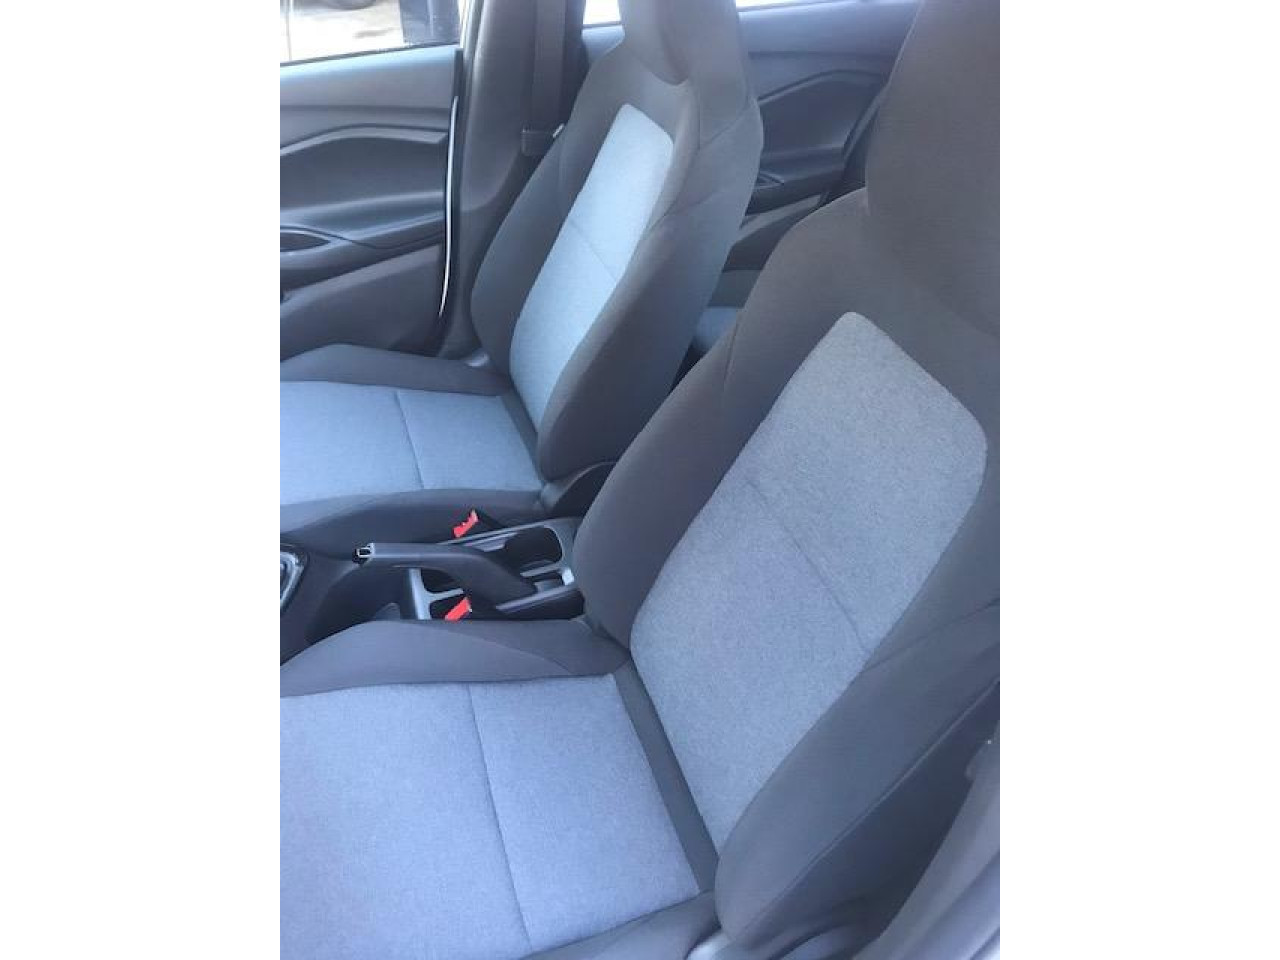 Onix Hatch 1.0 4P FLEX LT PLUS